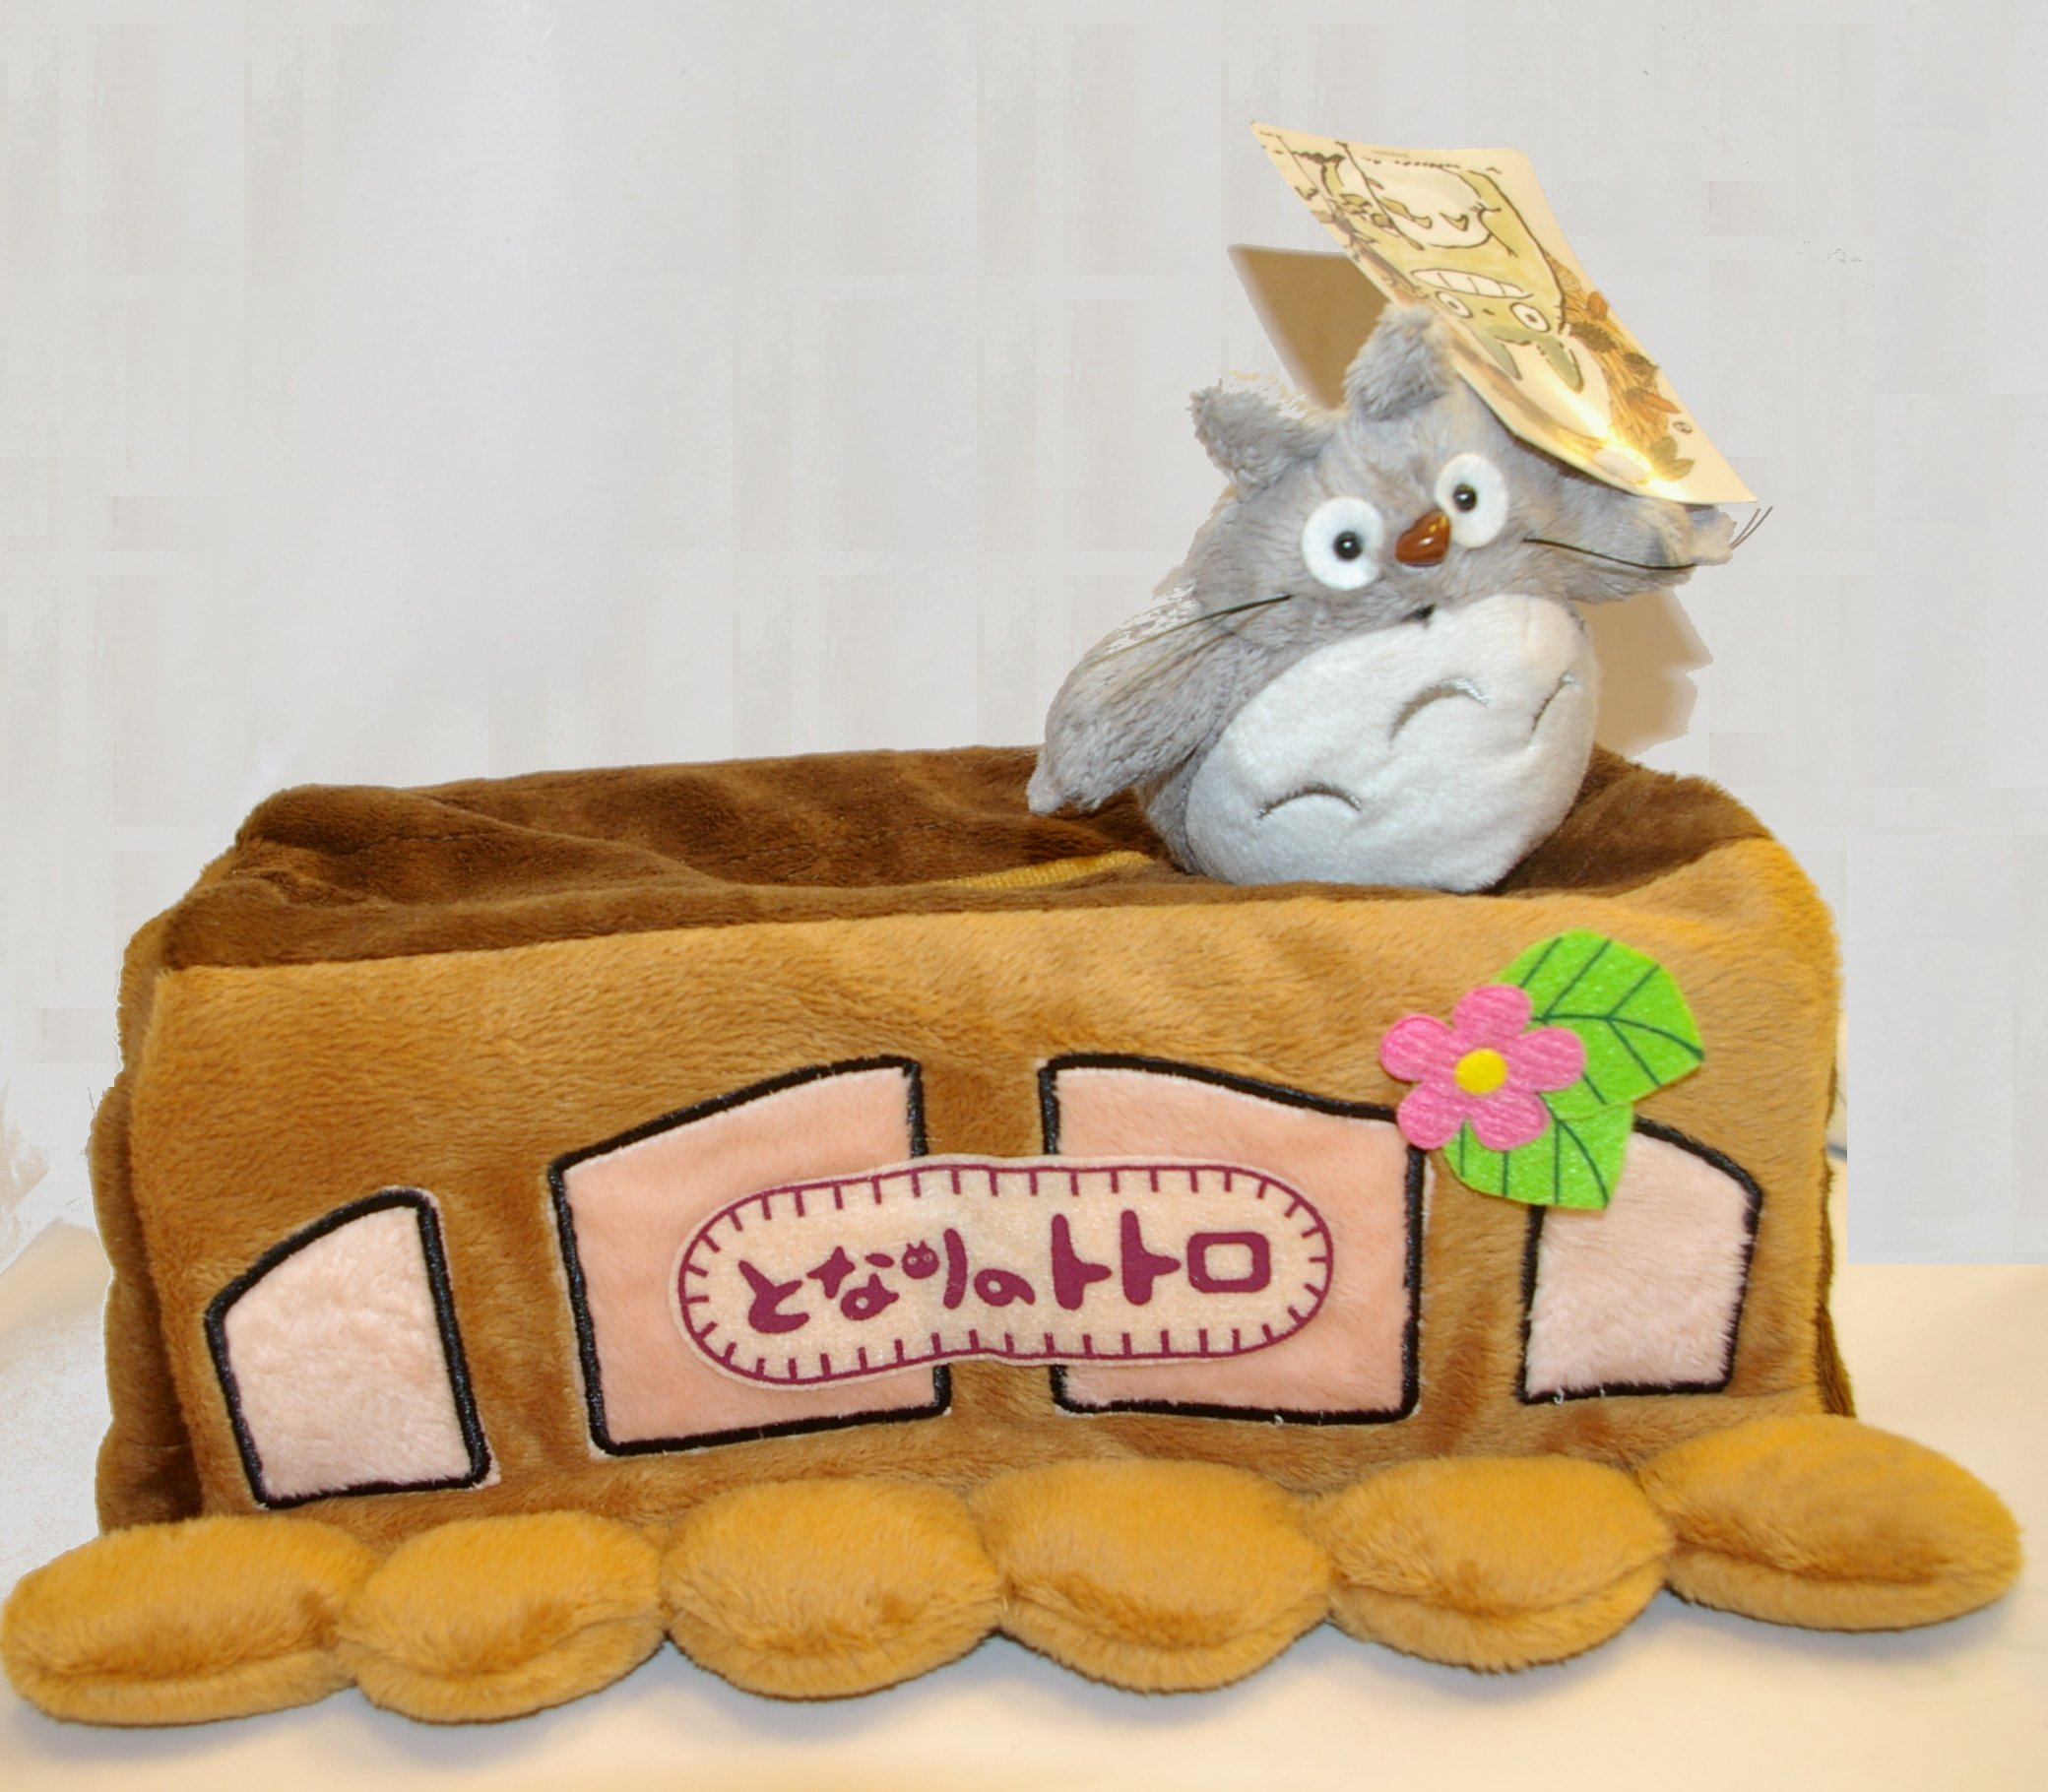 Protège mouchoir Totoro / nekobus